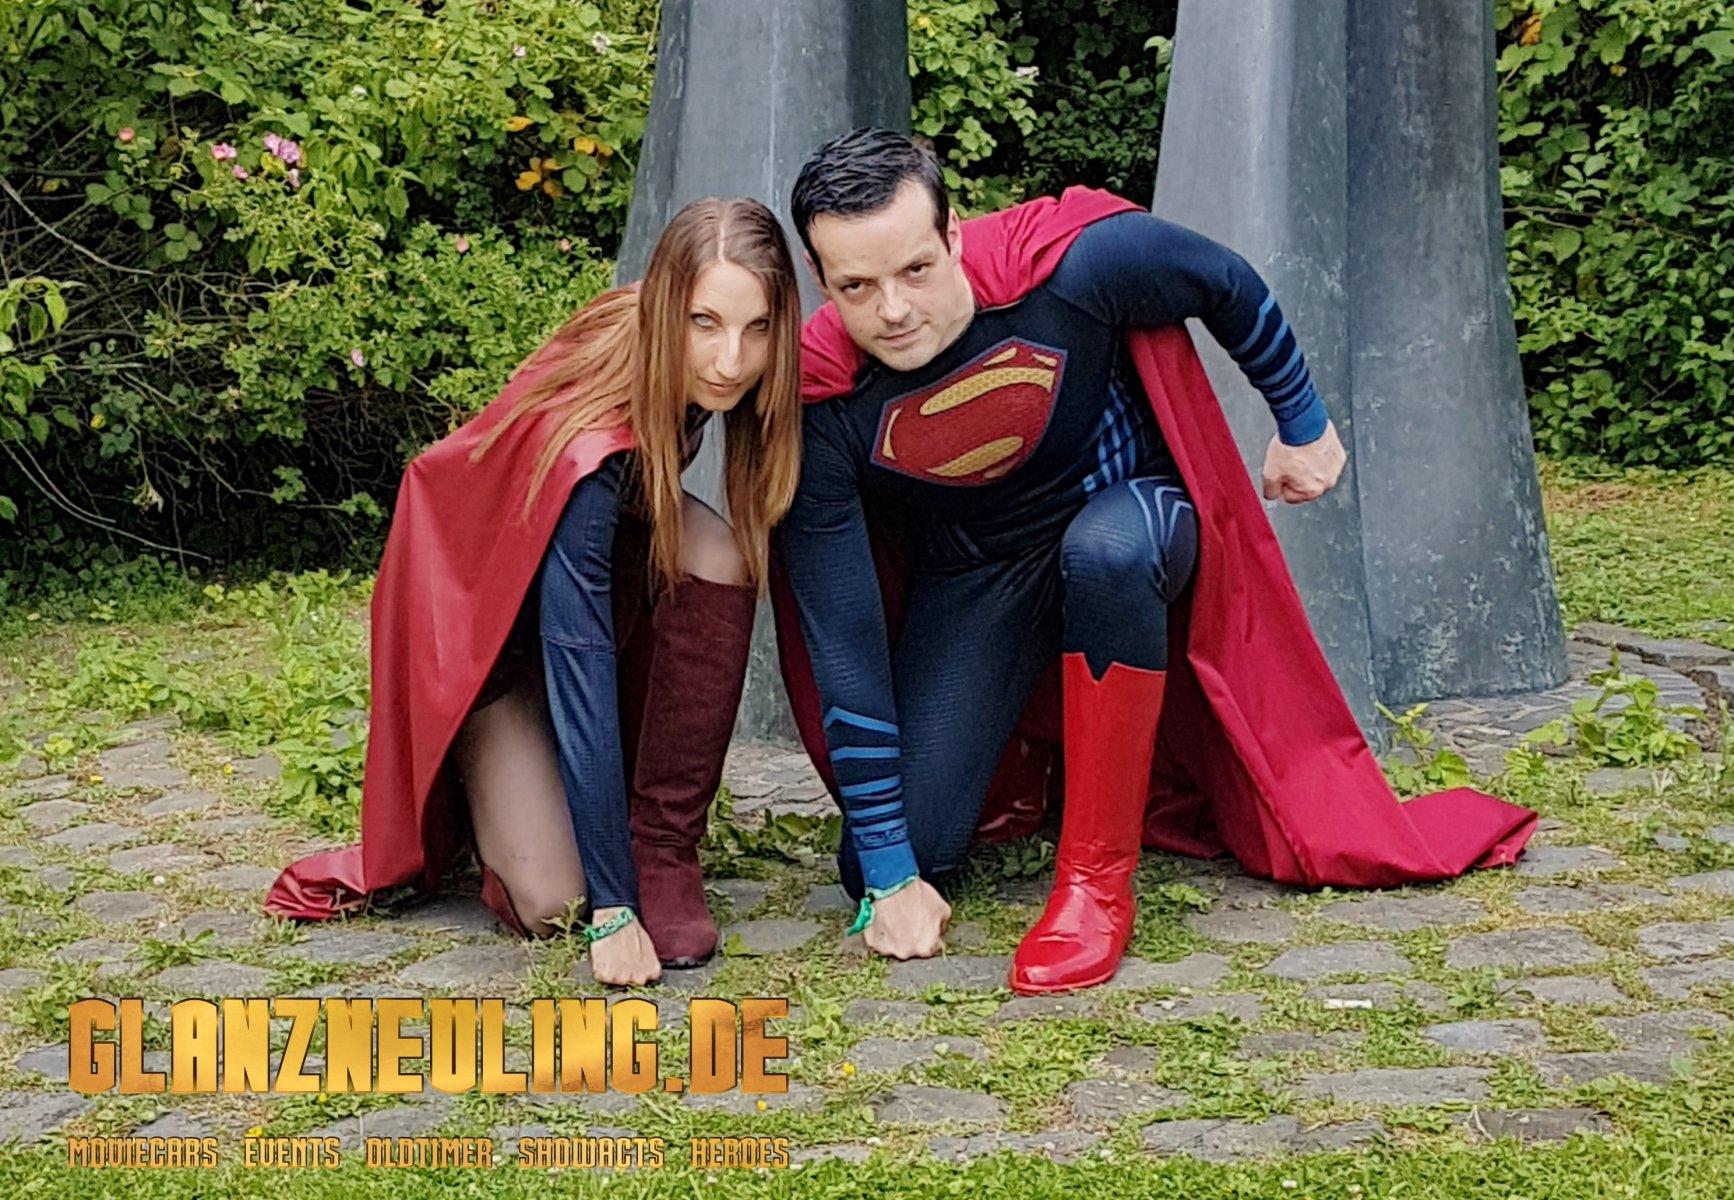 Superheld Double mieten